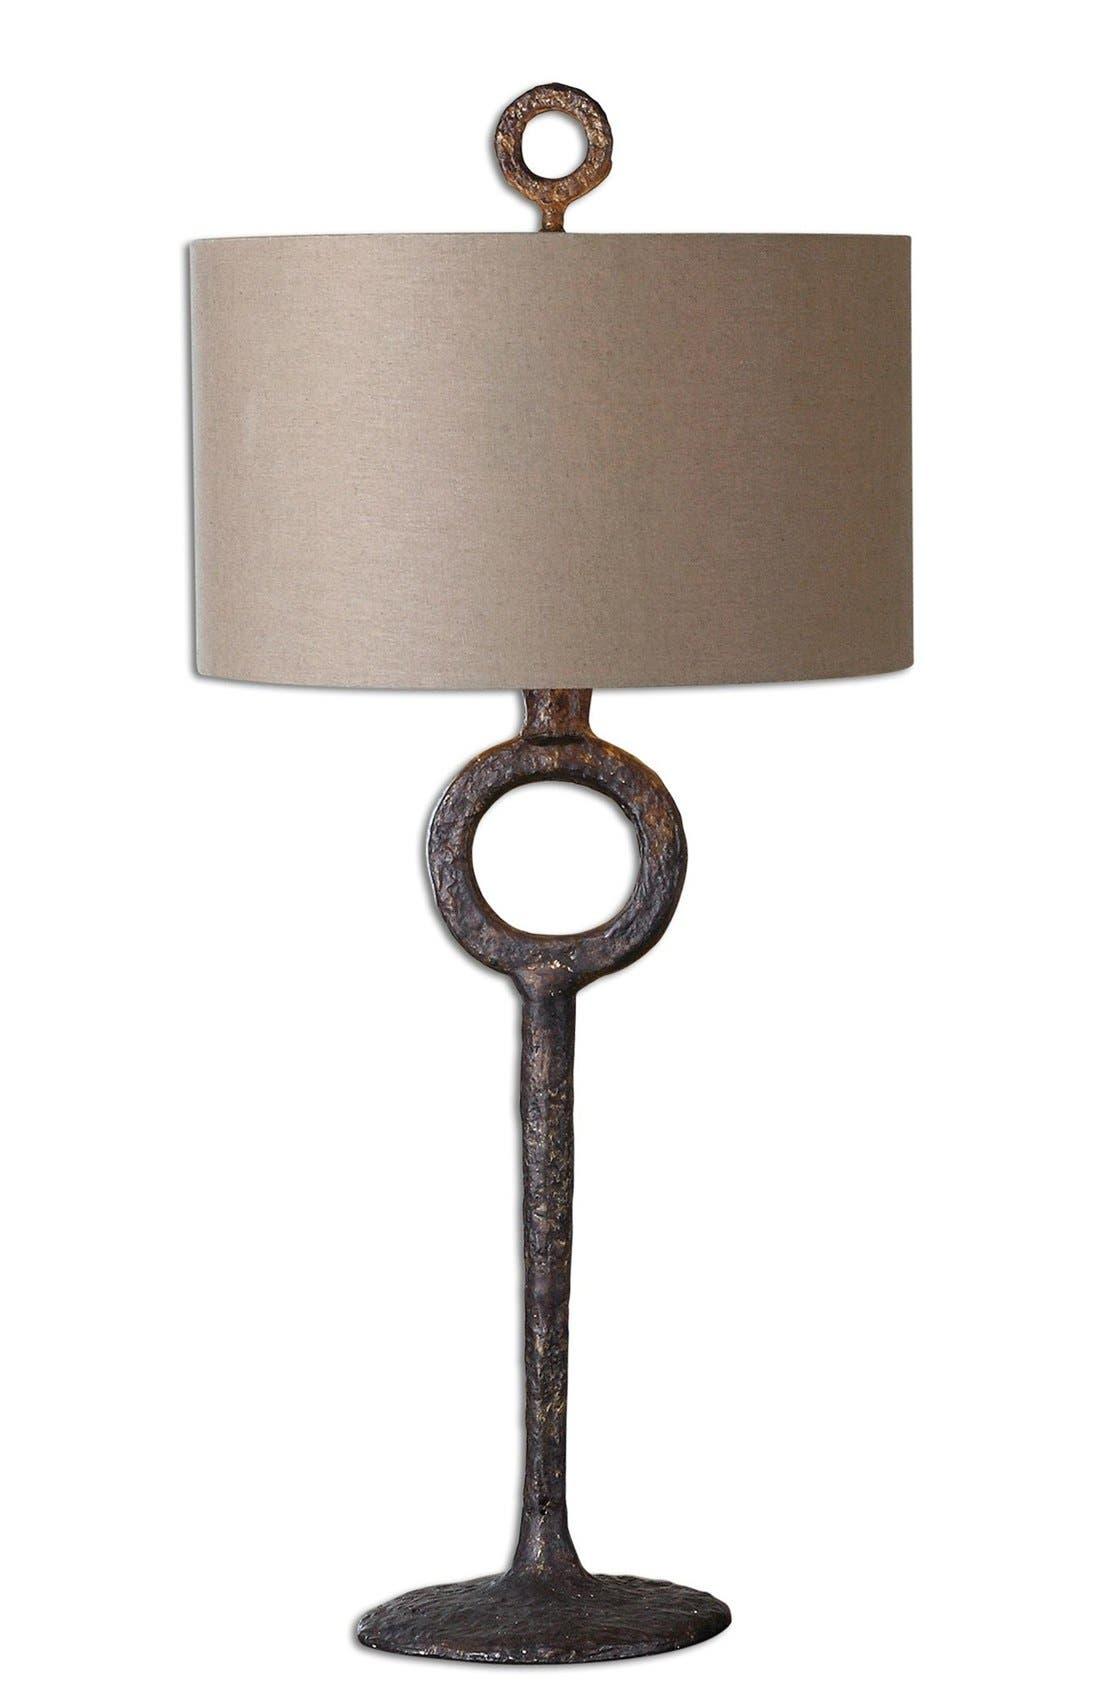 Alternate Image 1 Selected - Uttermost 'Ferro' Cast Iron Table Lamp